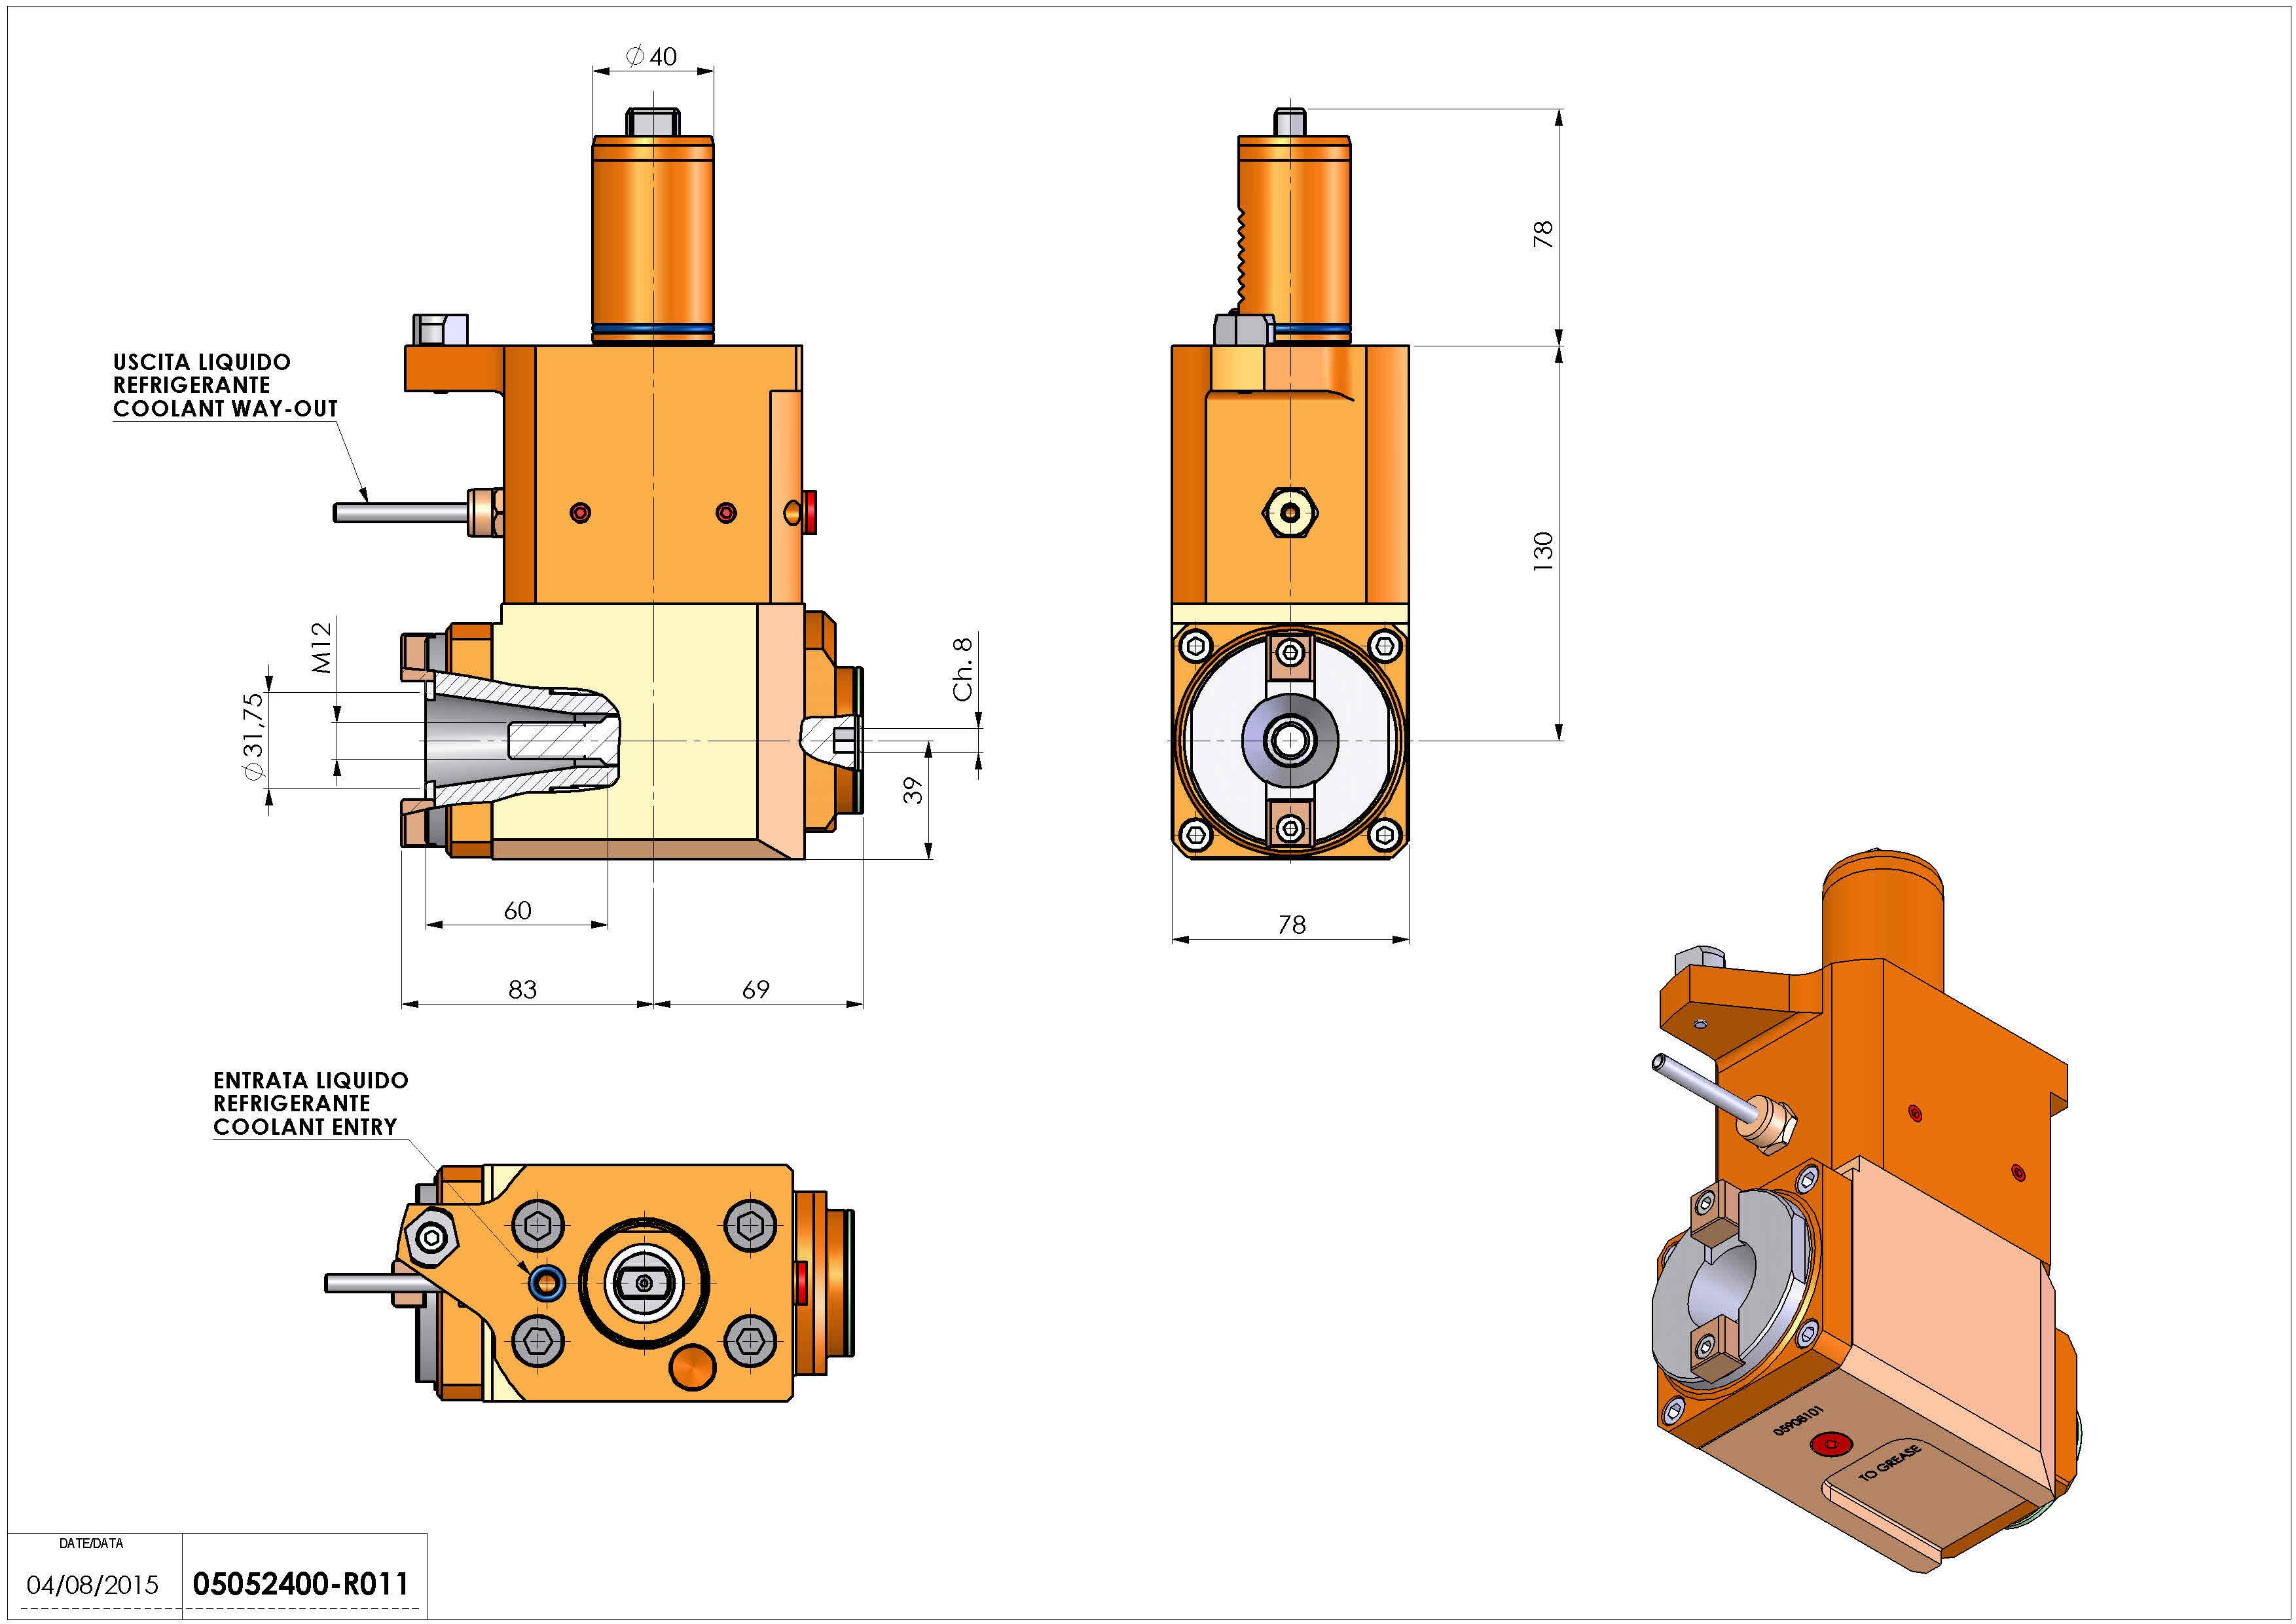 Technical image - LT-A VDI40 ISO-BT30 H130 MZ.